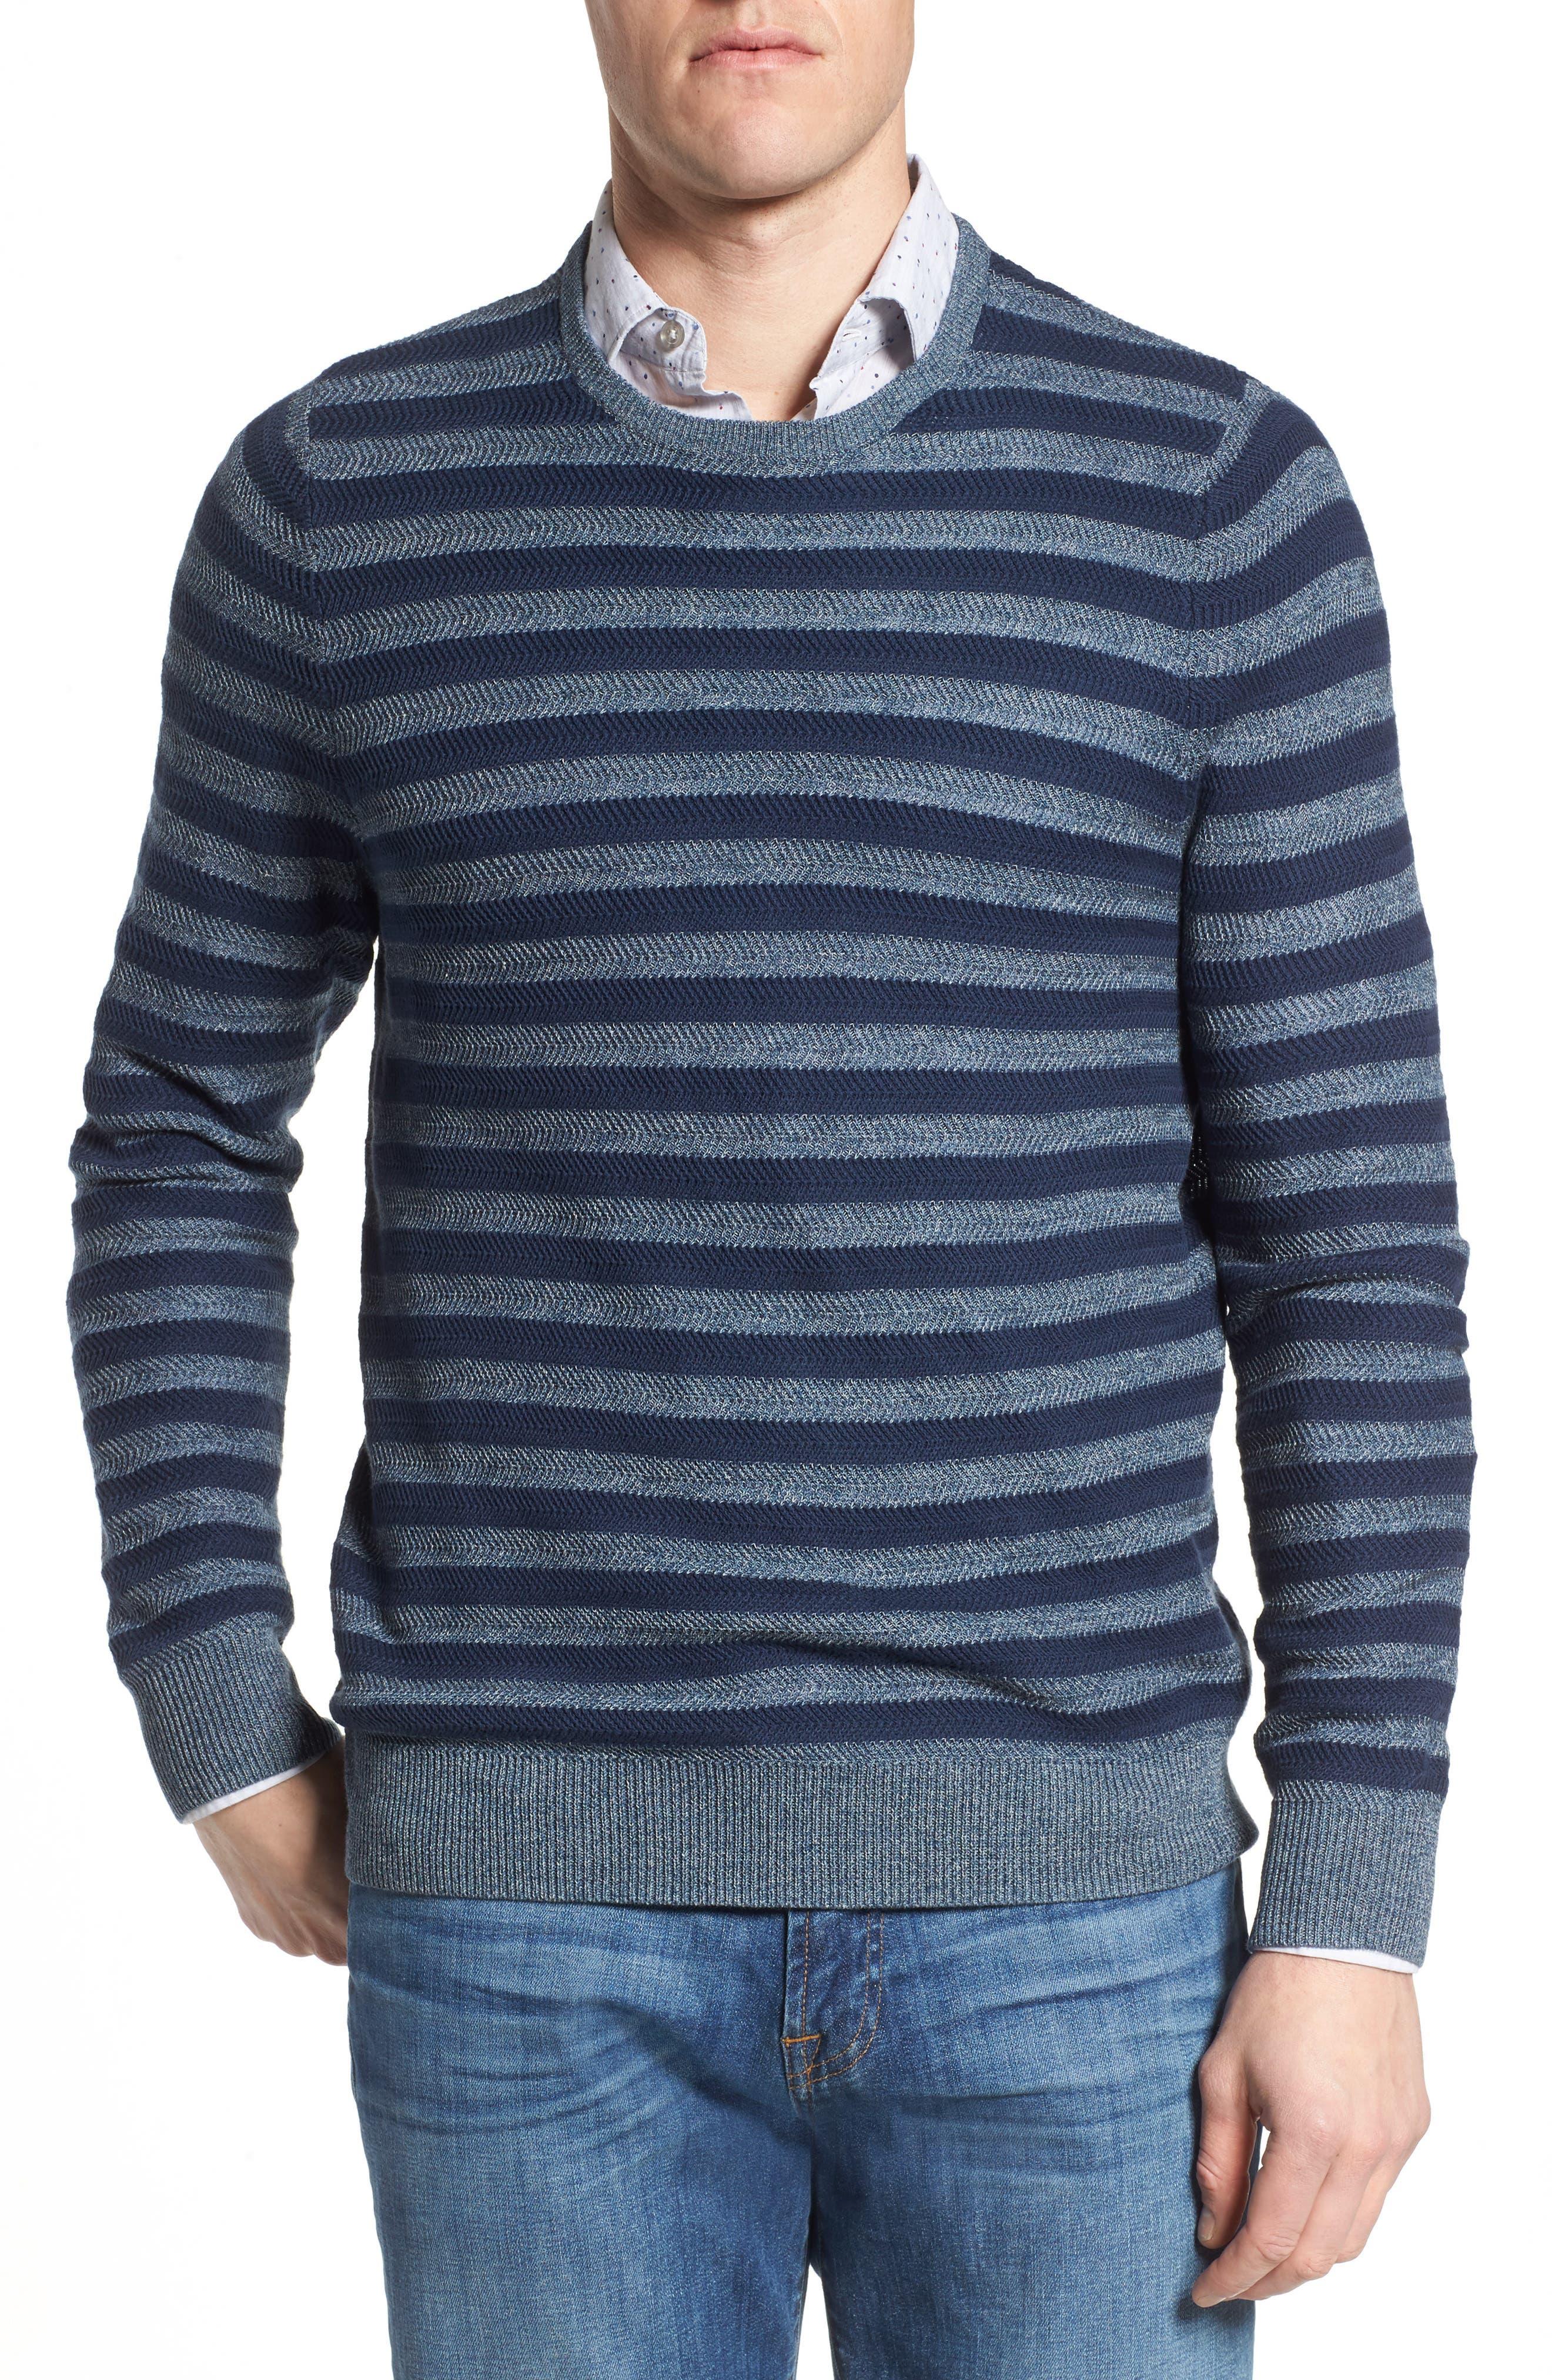 Nordstrom Men's Shop Stripe Cotton Blend Sweater